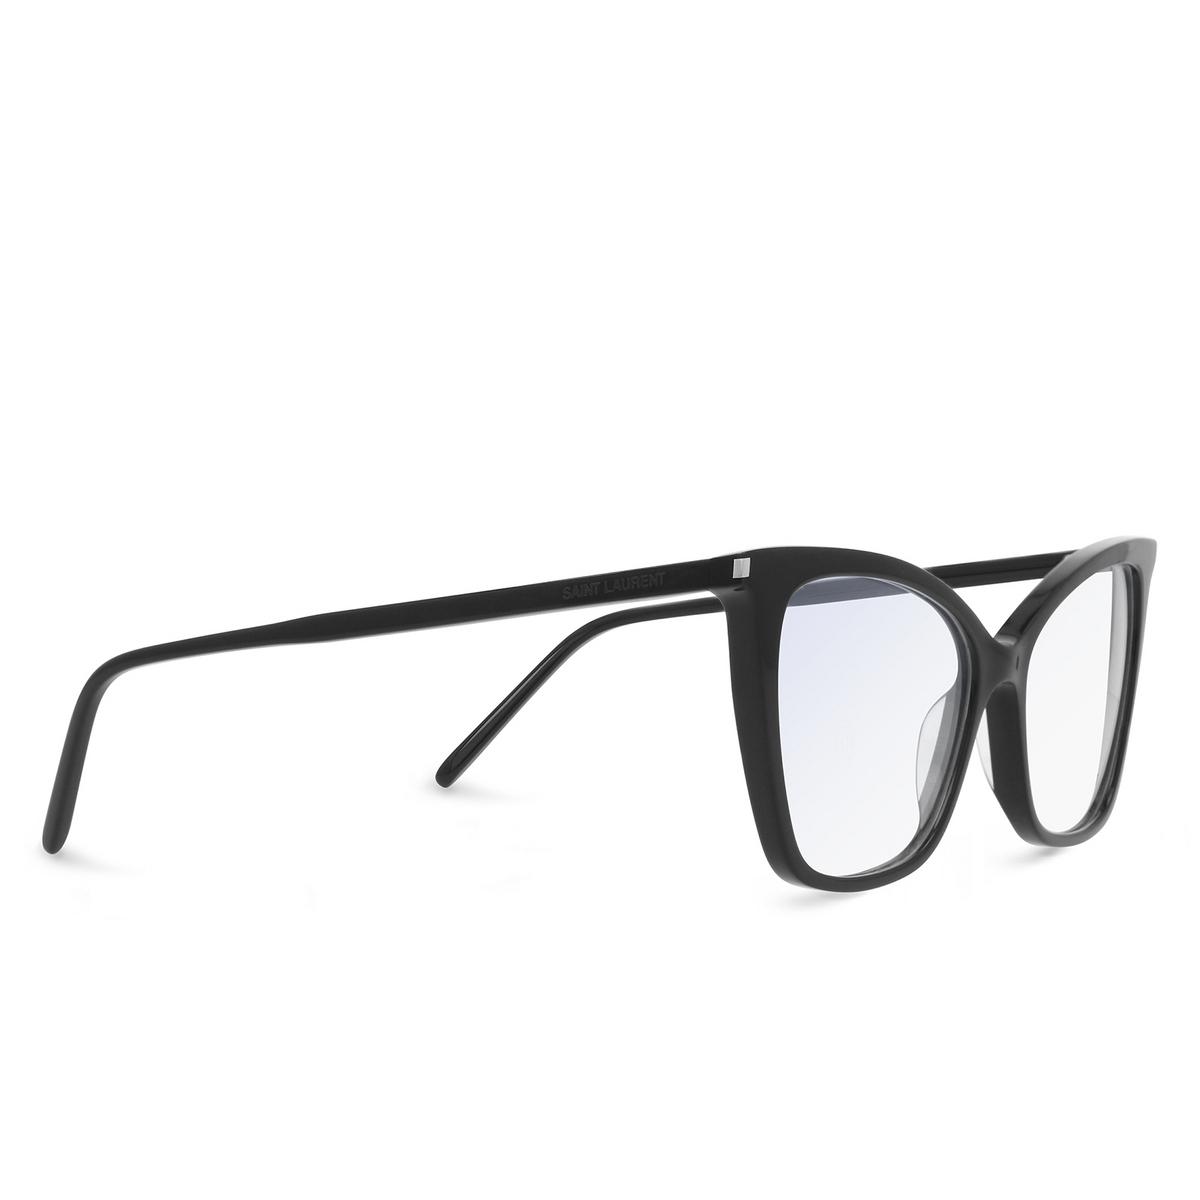 Saint Laurent® Cat-eye Eyeglasses: SL 386 color Black 001.